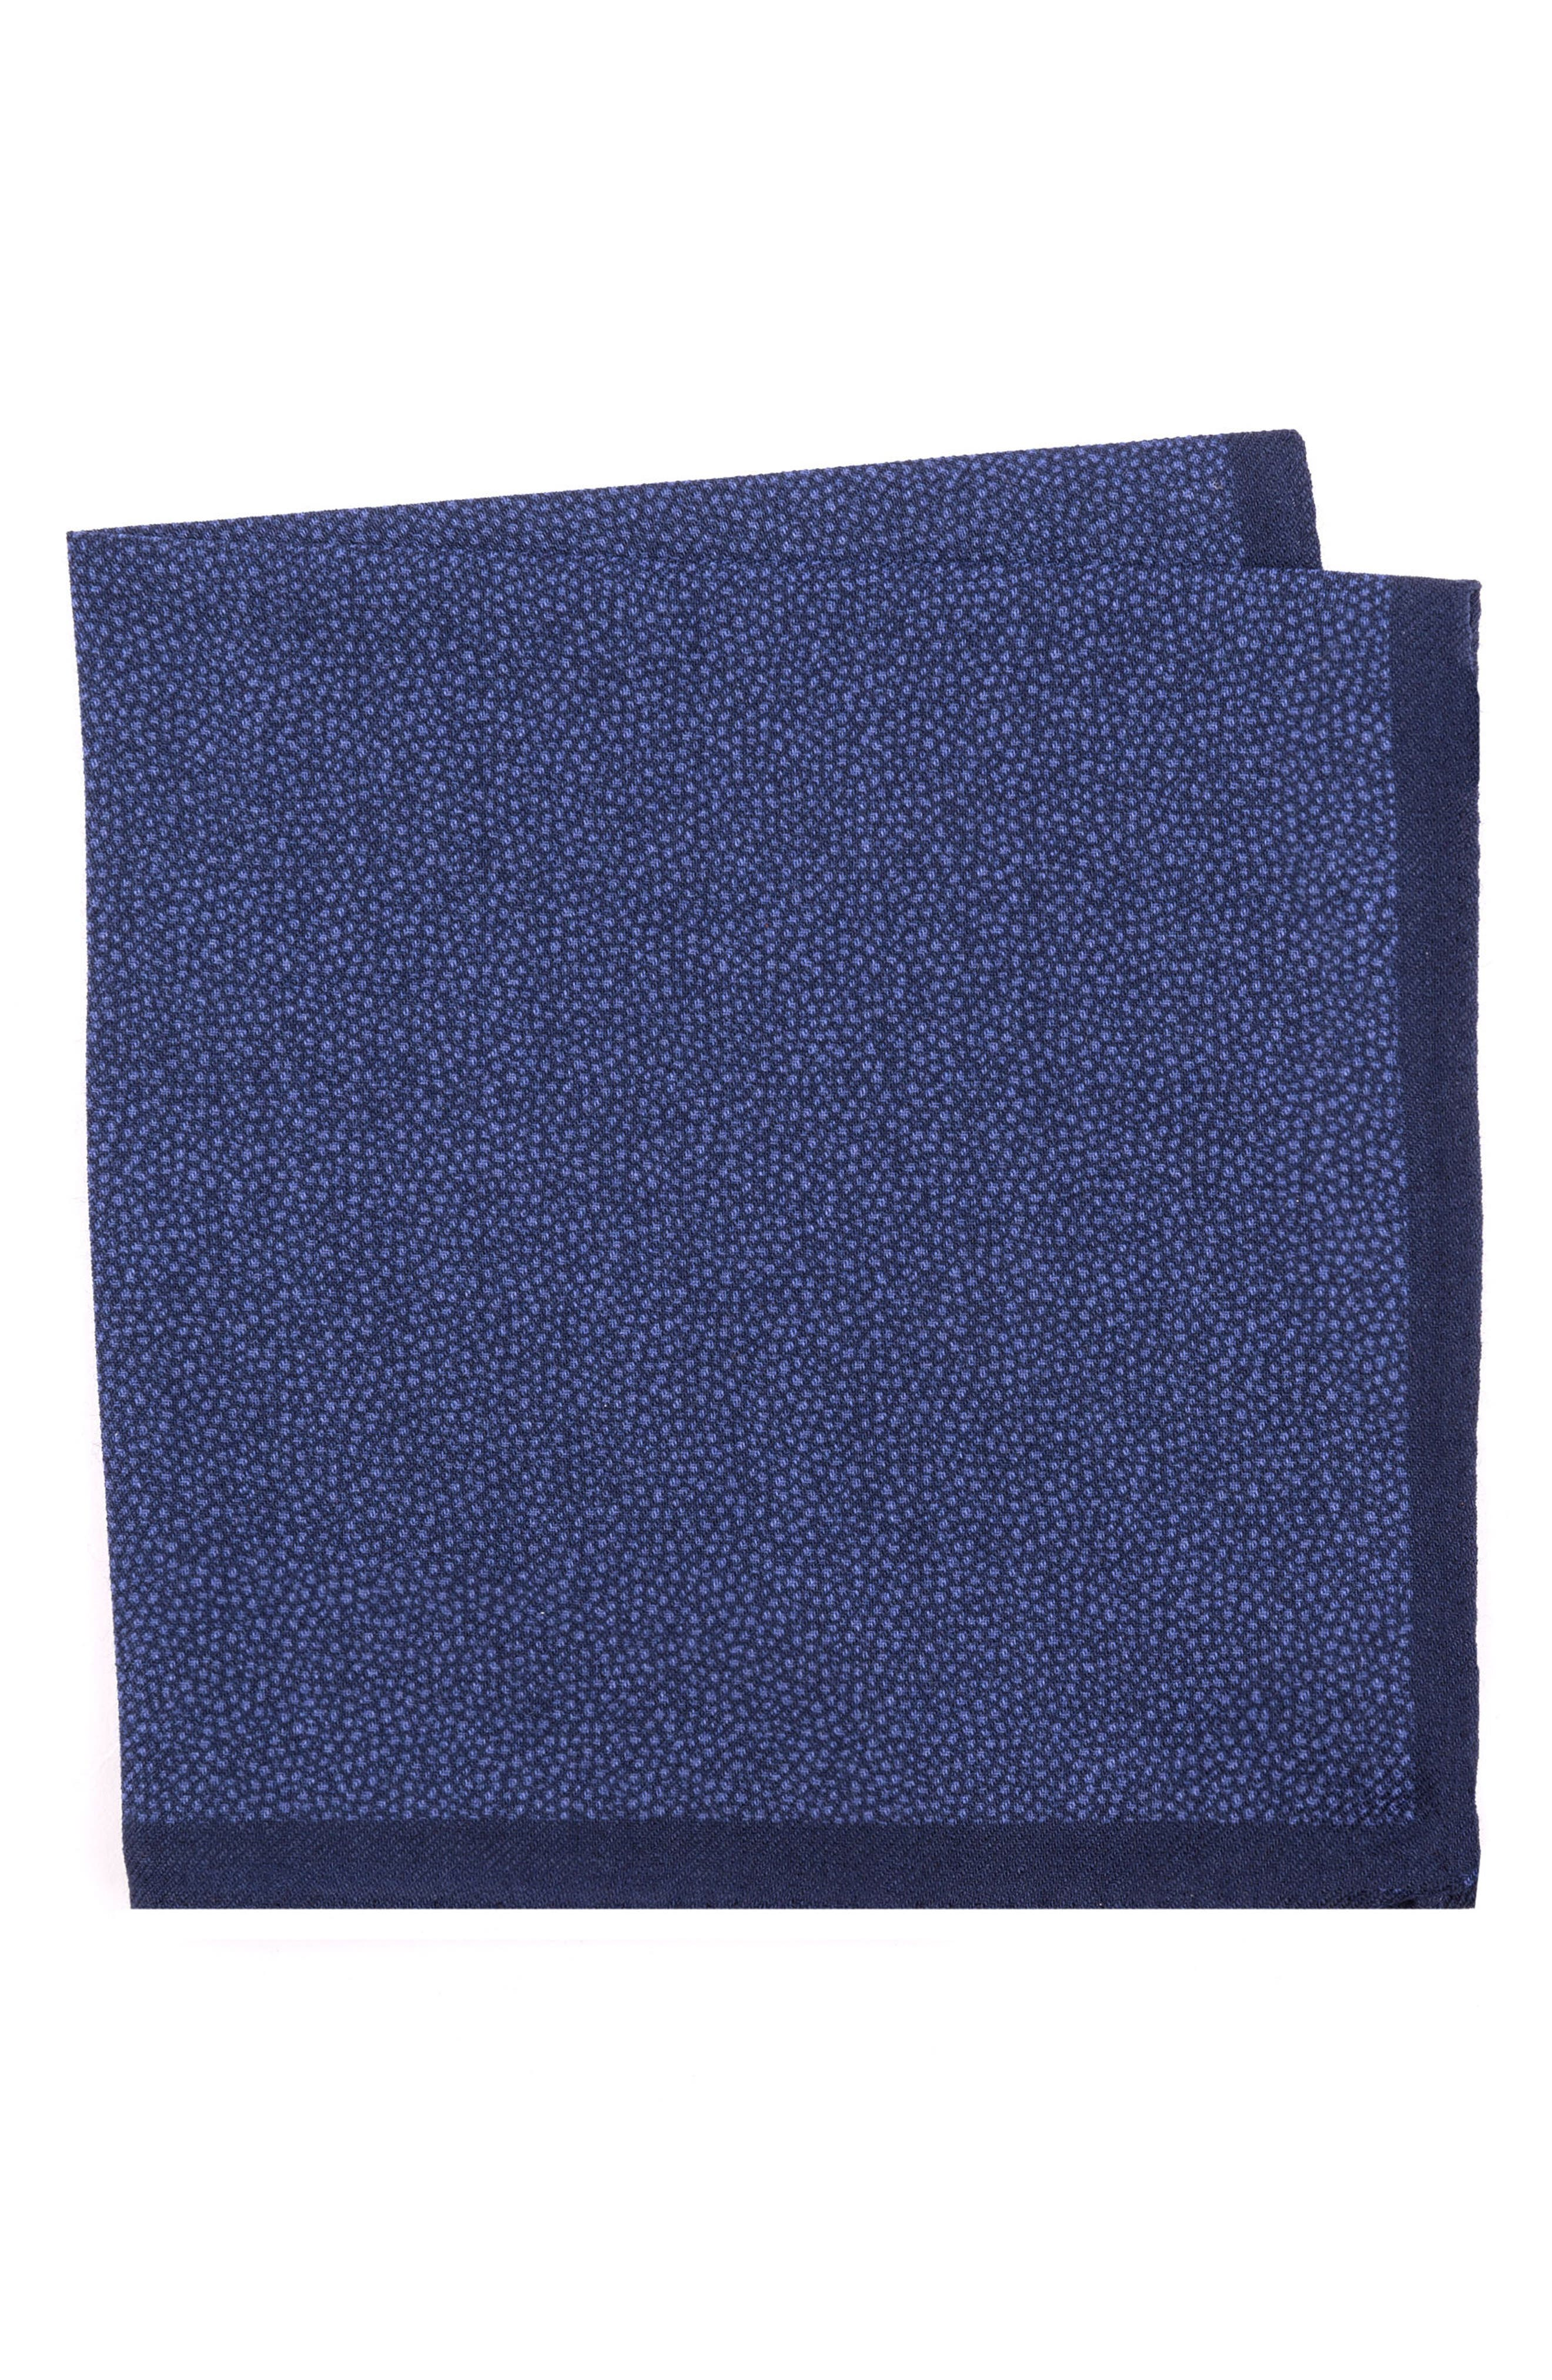 Ted Baker London Dot Wool Pocket Square